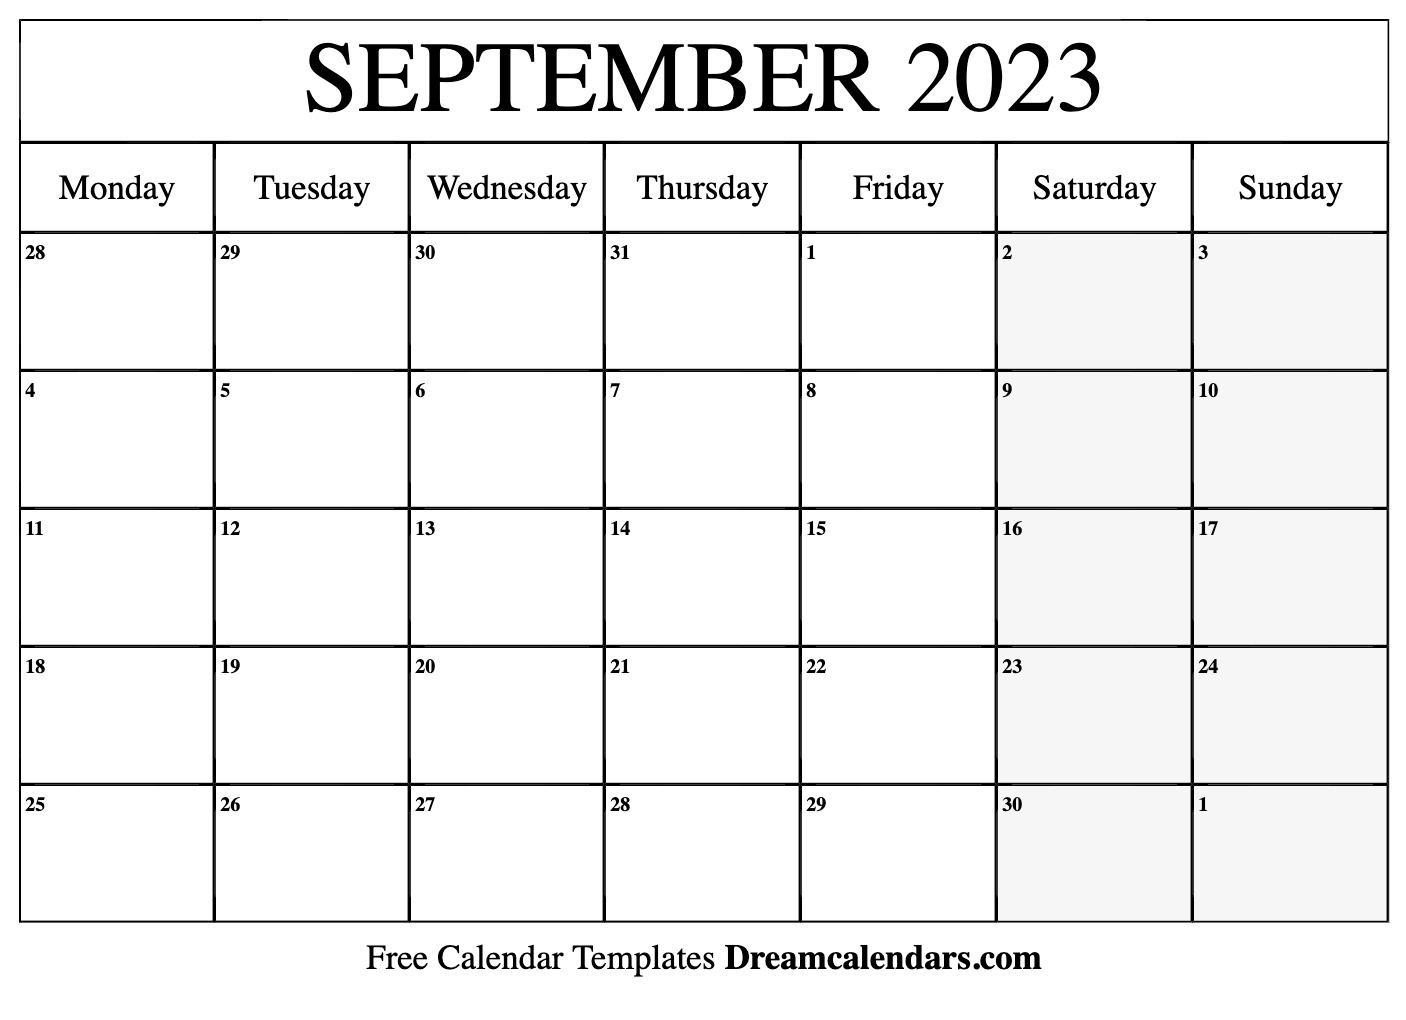 September 2023 Calendar | Free Blank Printable Templates throughout Sunset And Sunrise Calender 2022 2023